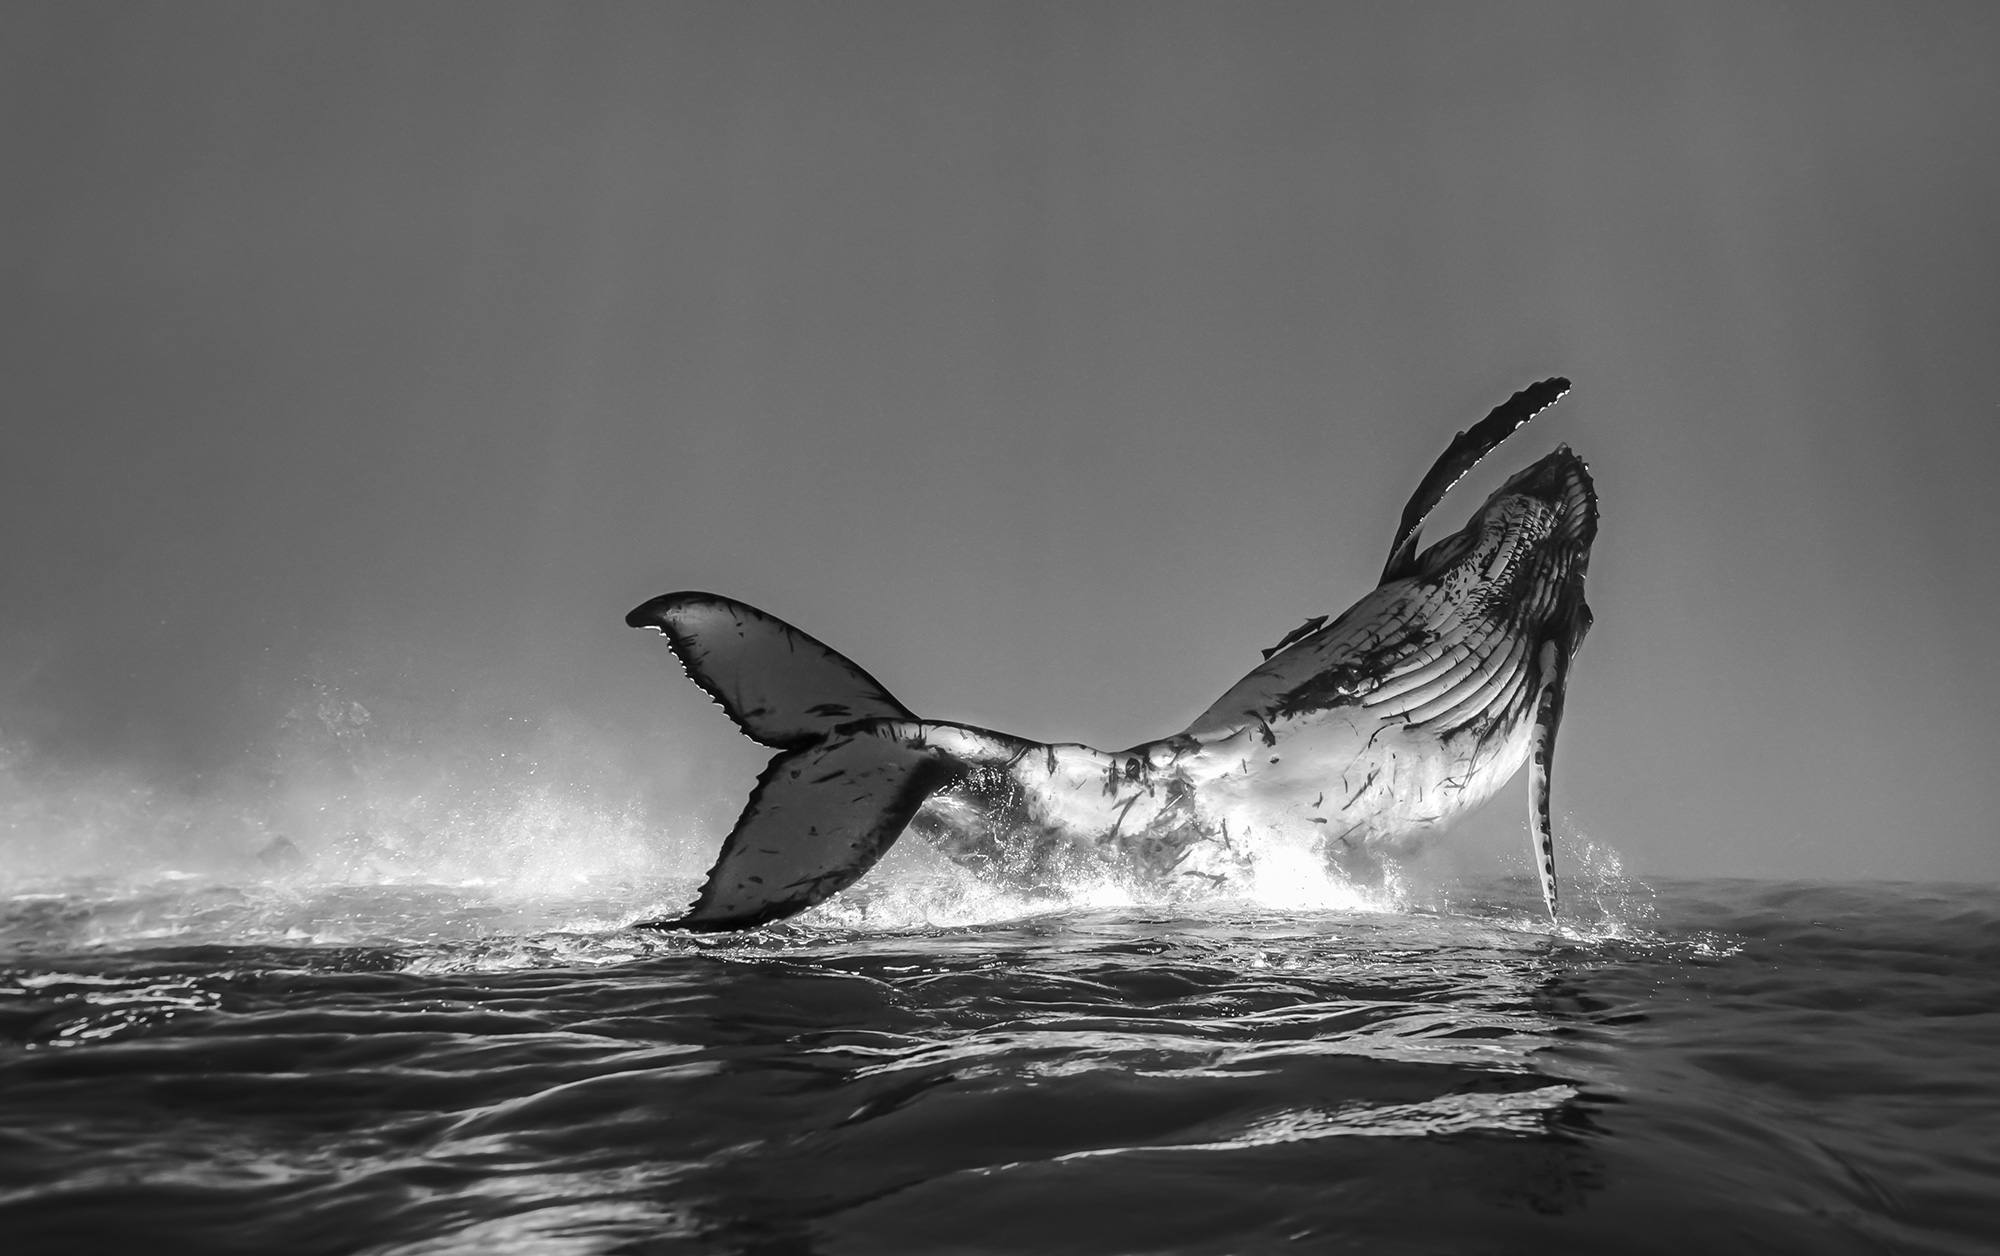 Ocean Photography Awards 2020 Introduction